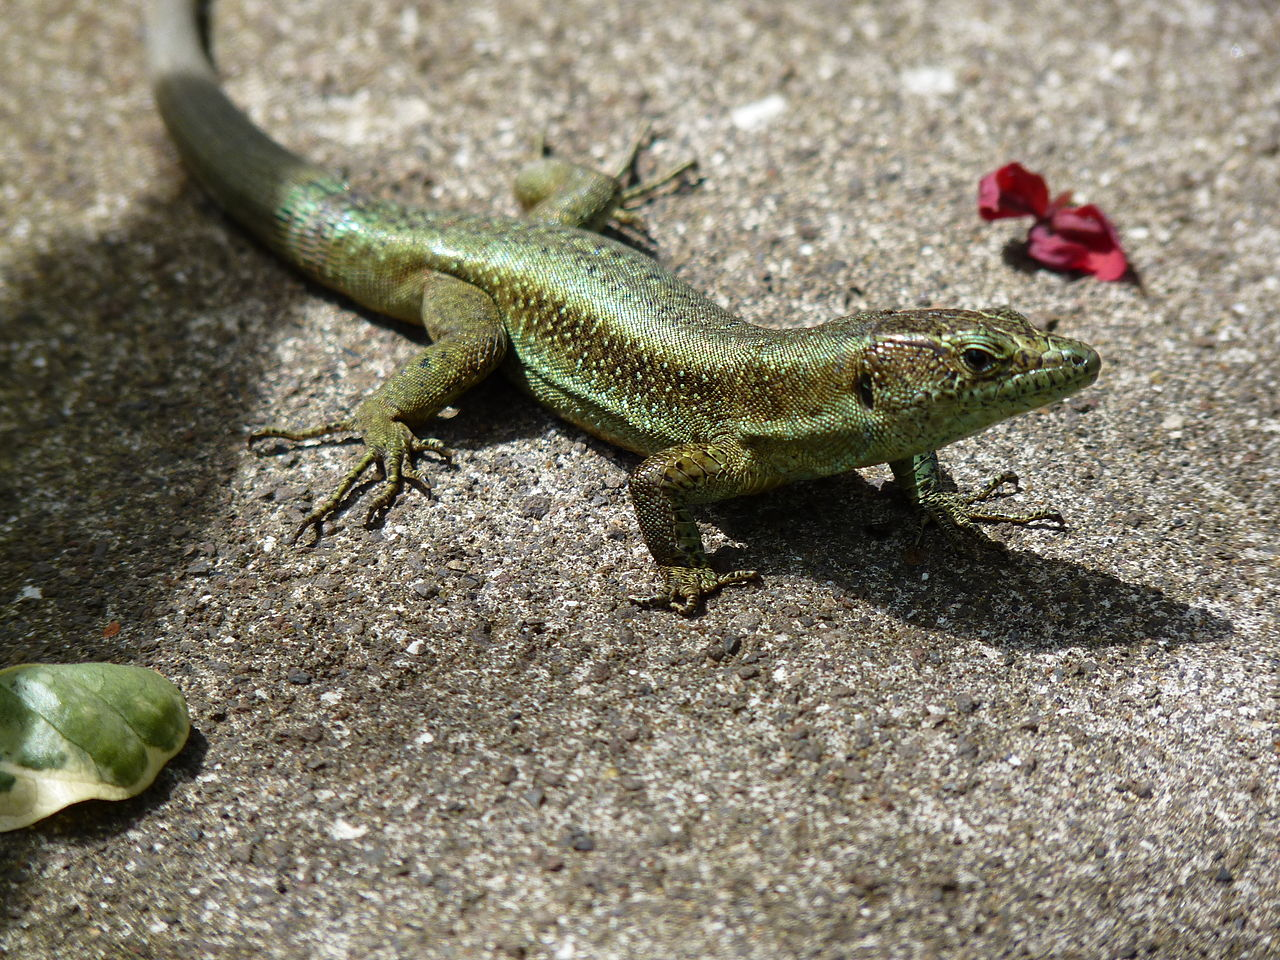 Lizard dating site